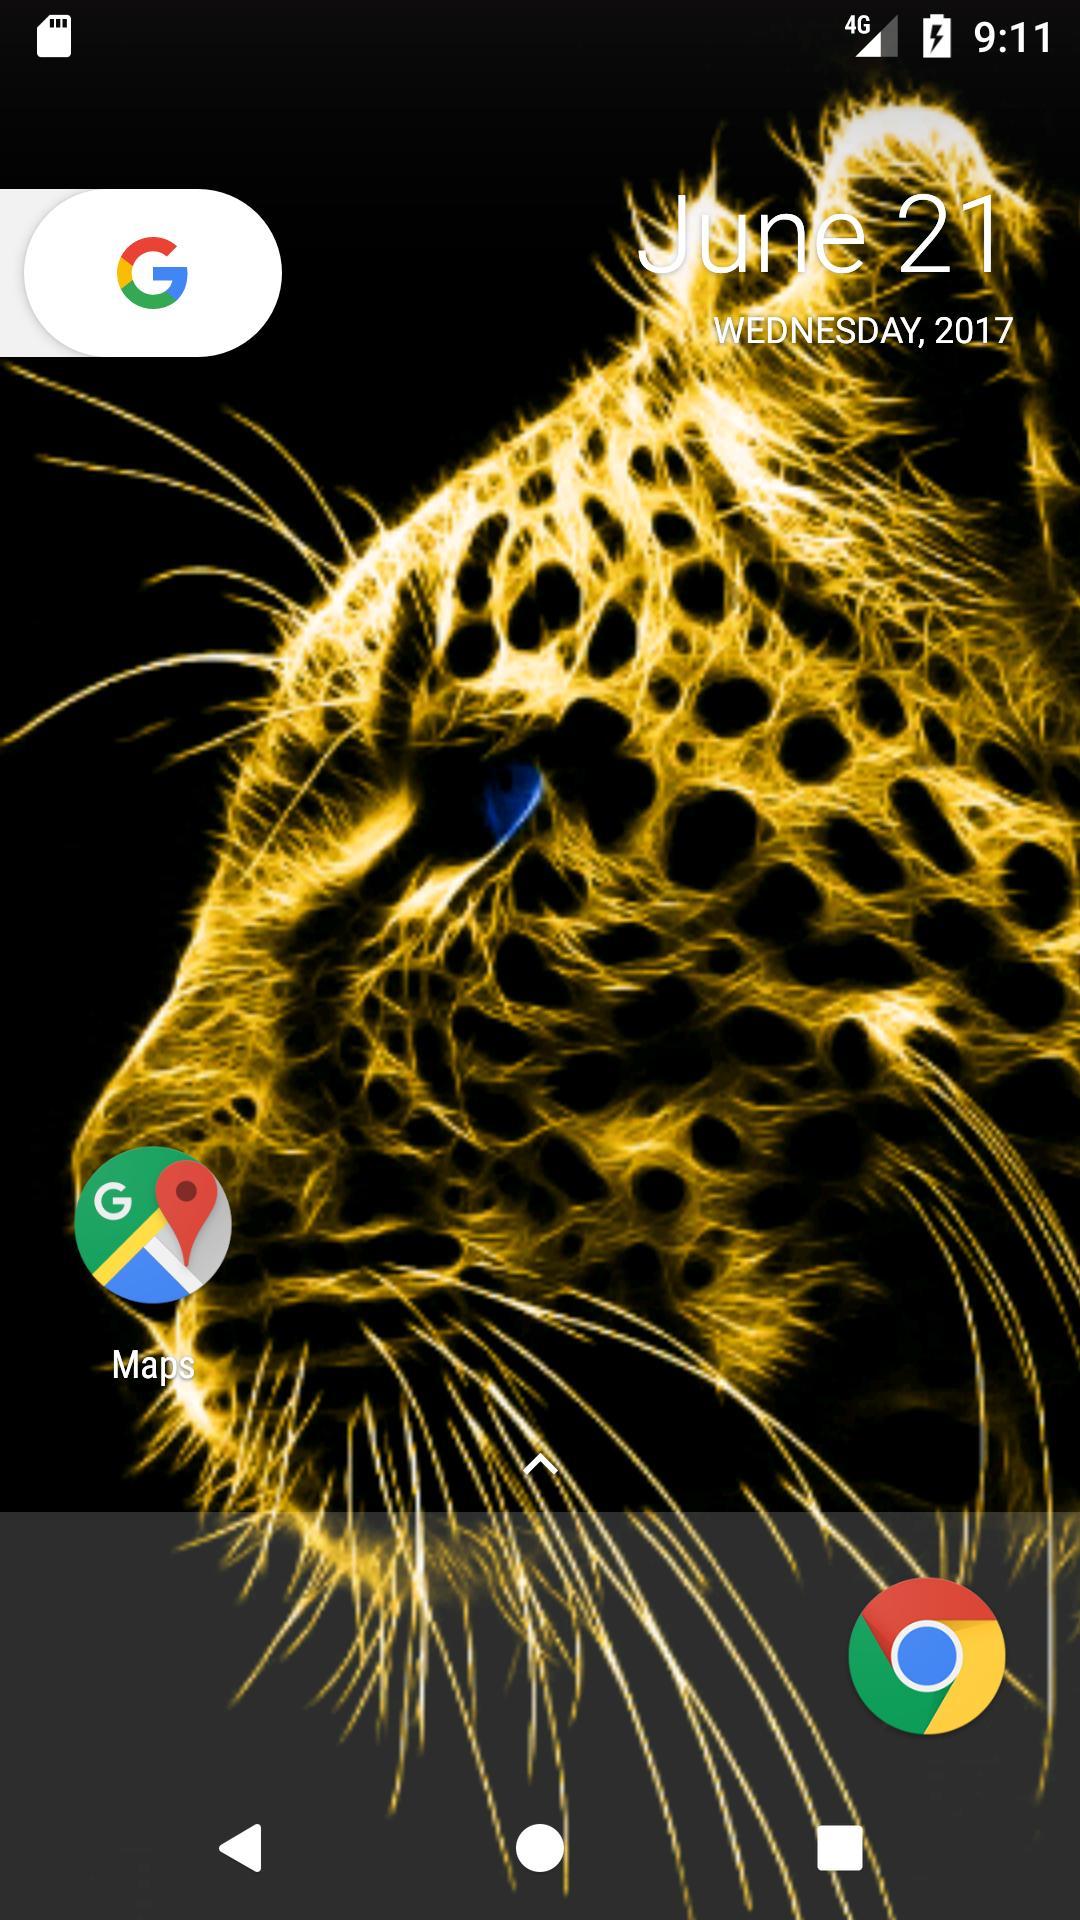 Unduh 8000 Wallpaper Black Gold Hd Android HD Terbaru